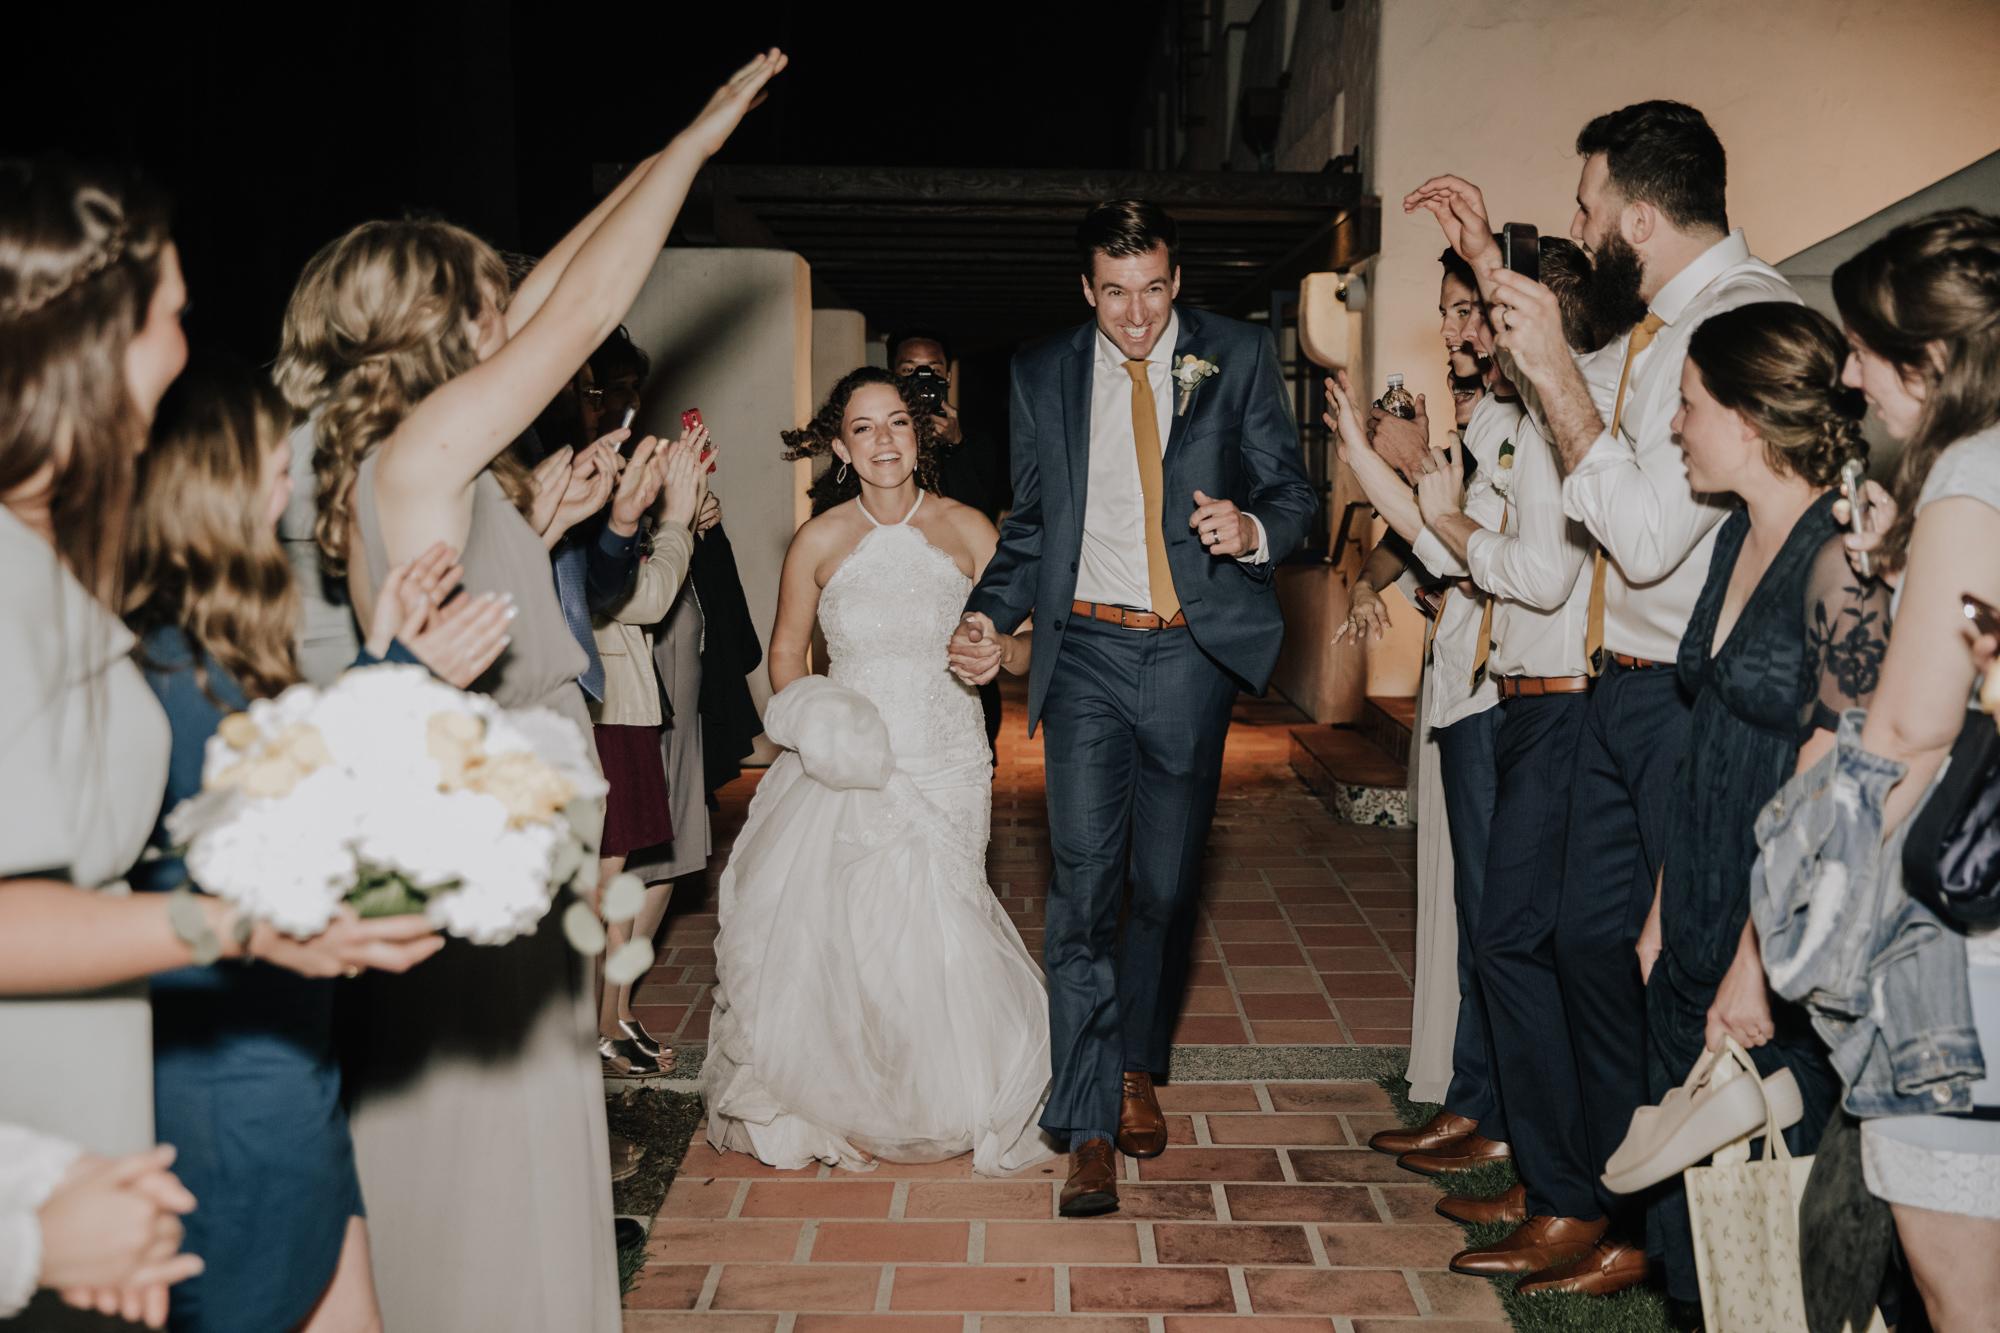 168-destination-wedding-san-clemente-california.jpg